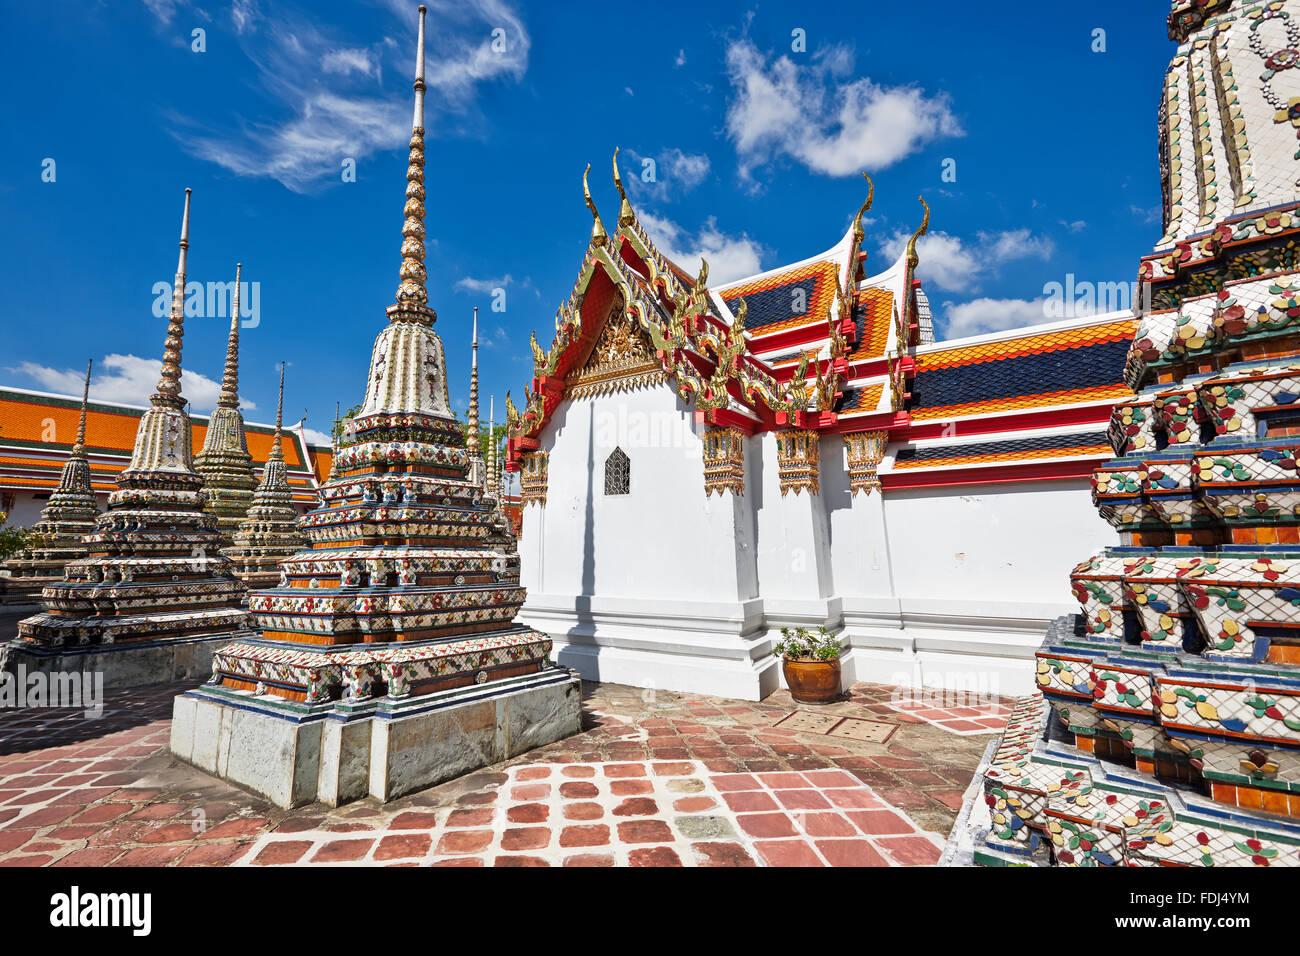 Pagode del Wat Pho tempio di Bangkok, Tailandia. Immagini Stock